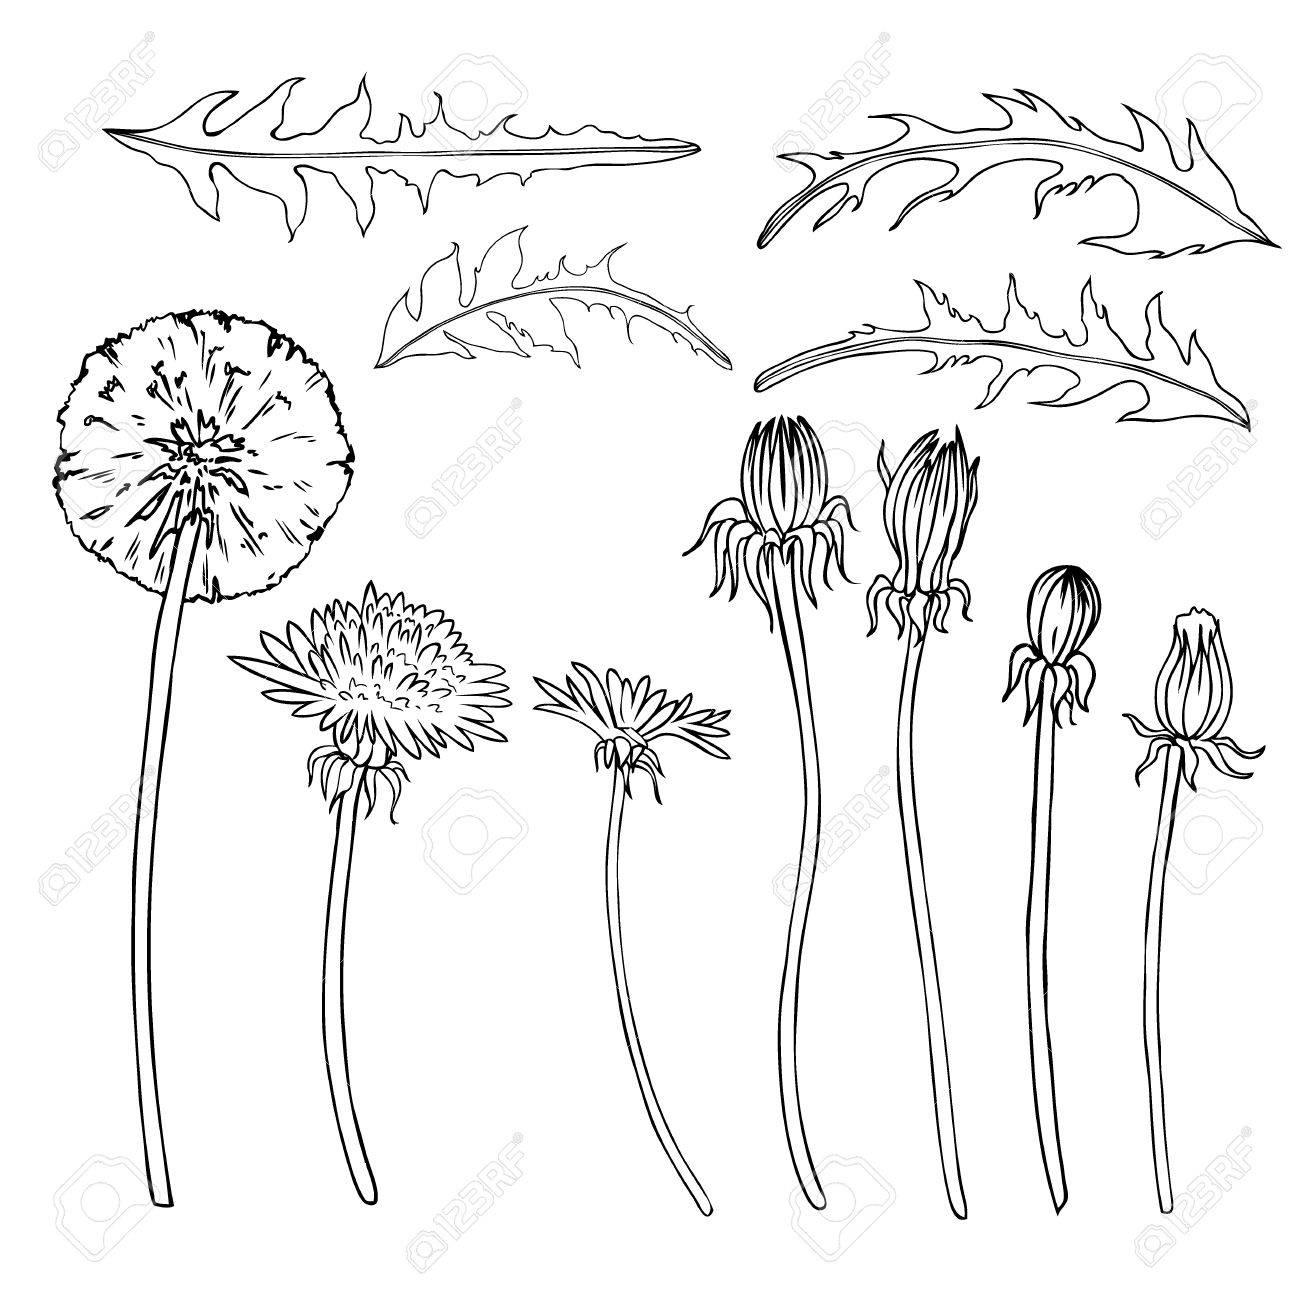 1300x1300 Dandelion Flower, Bud, Leaves Vector Engraving Botanical Sketch